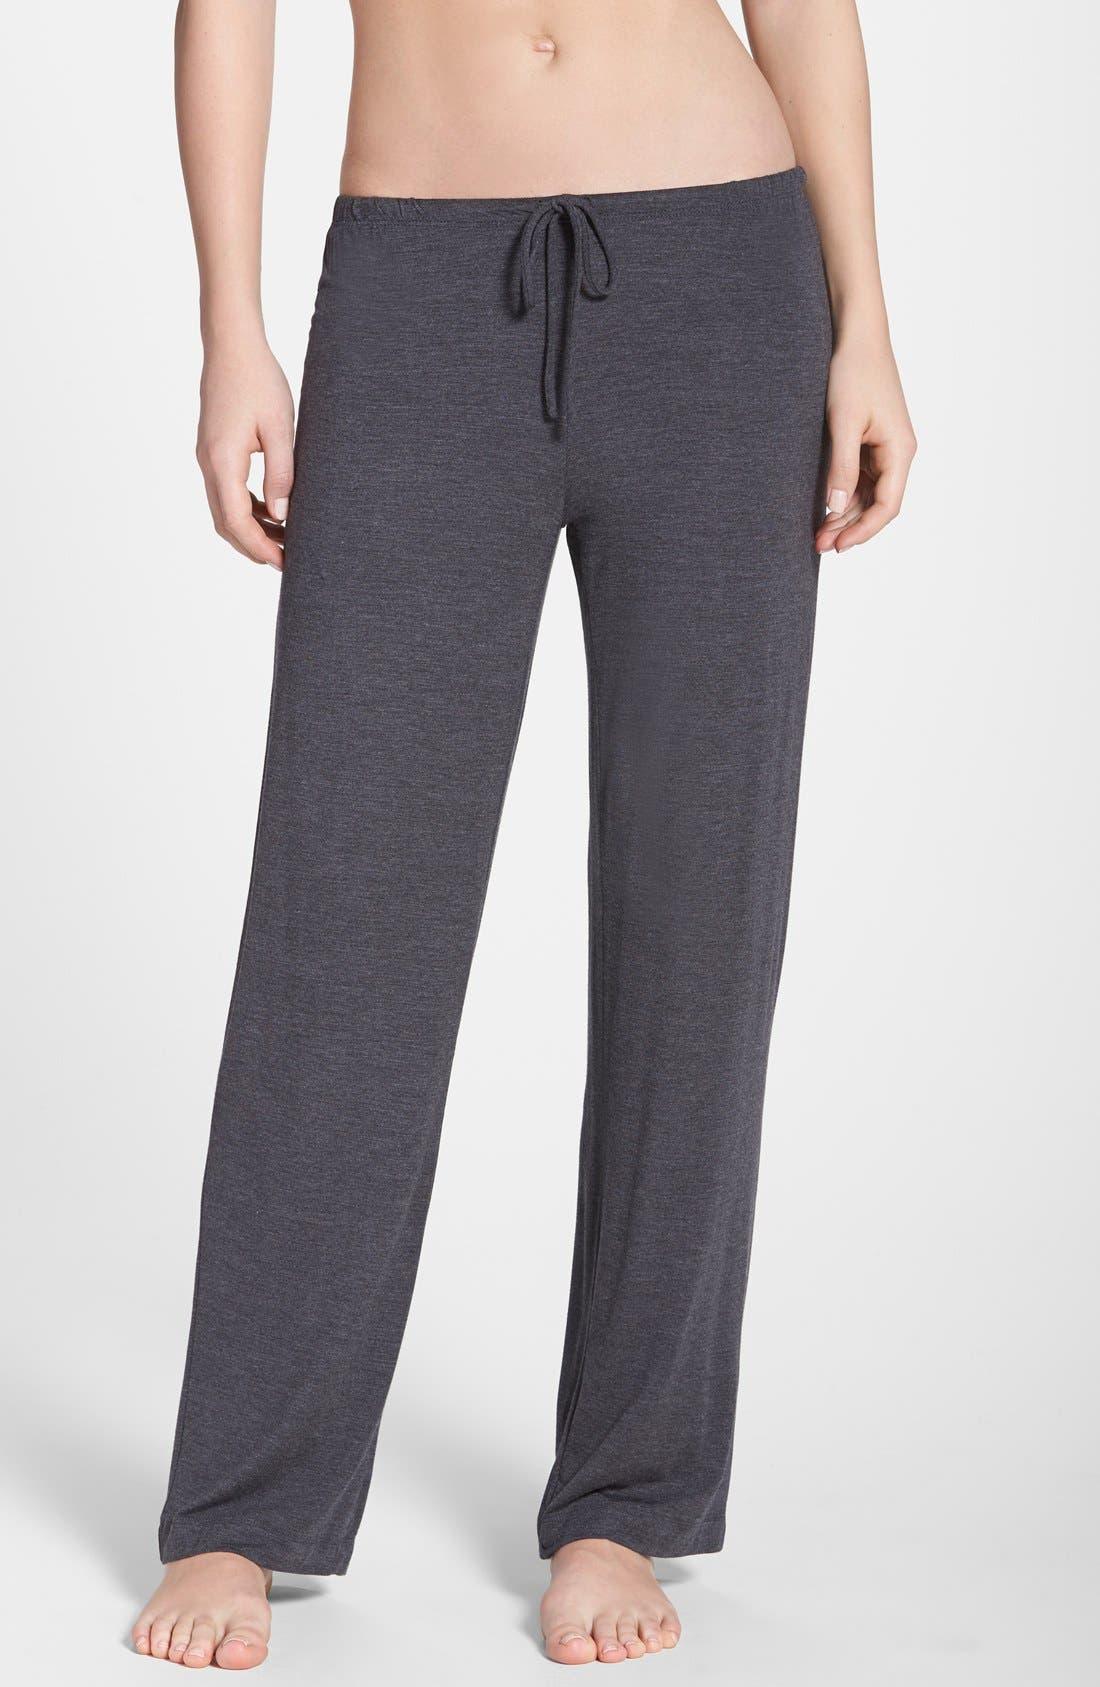 Main Image - DKNY 'Urban Essentials' Lounge Pants